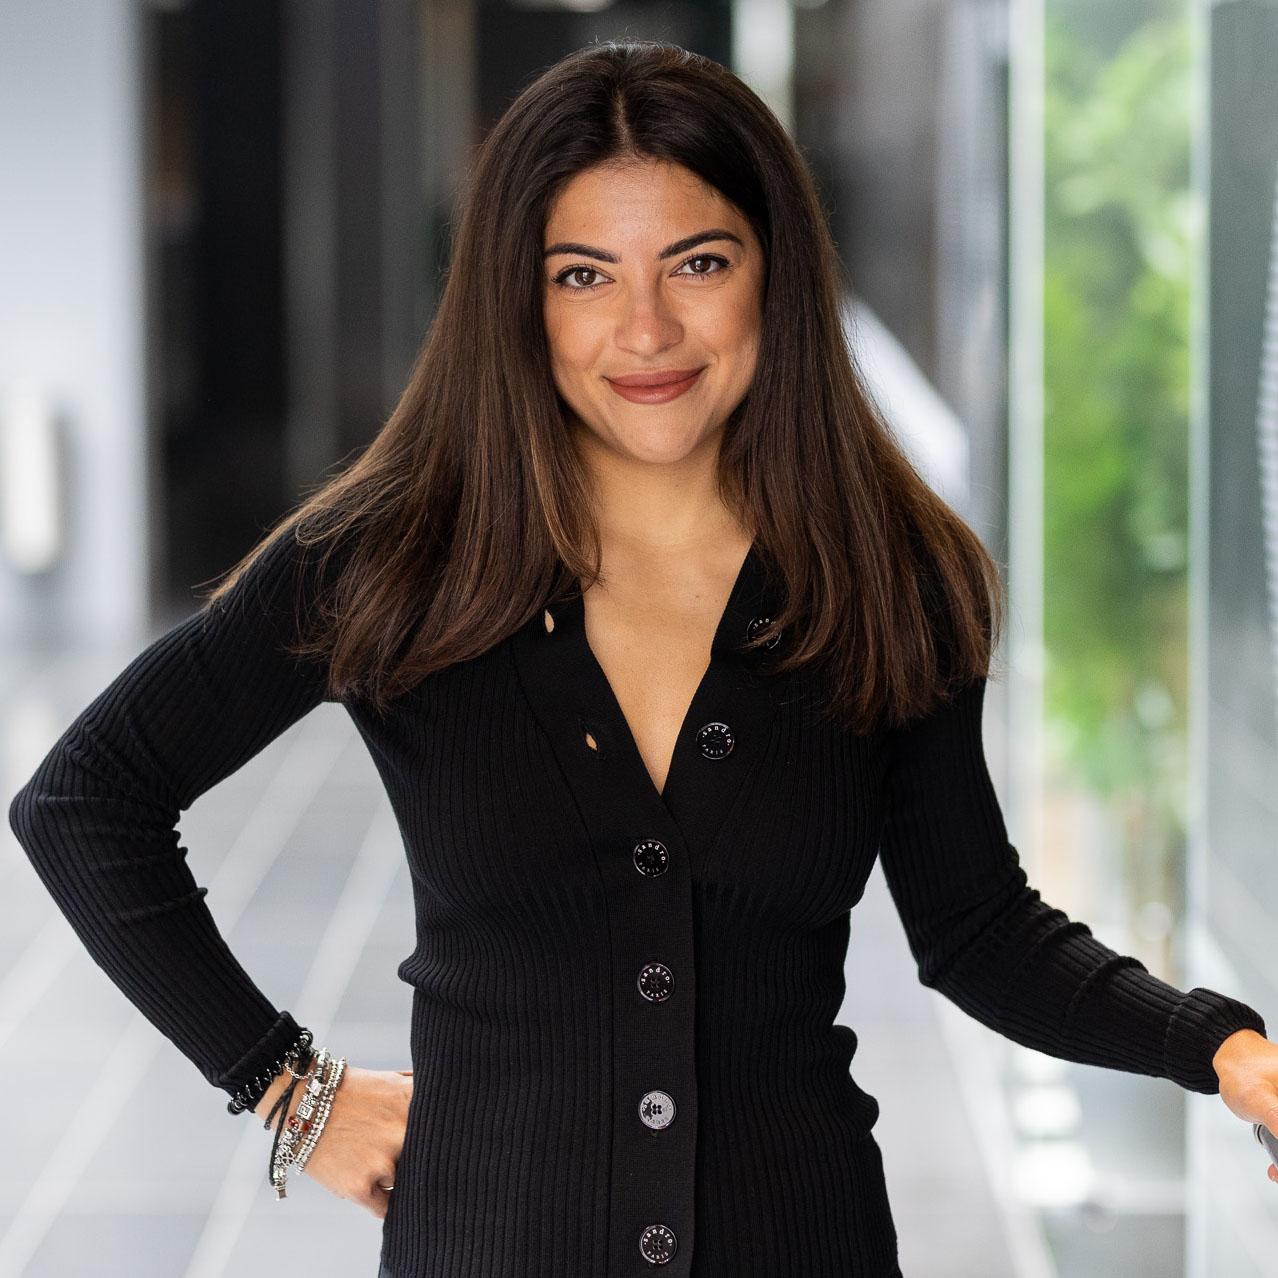 Paola Vivoli